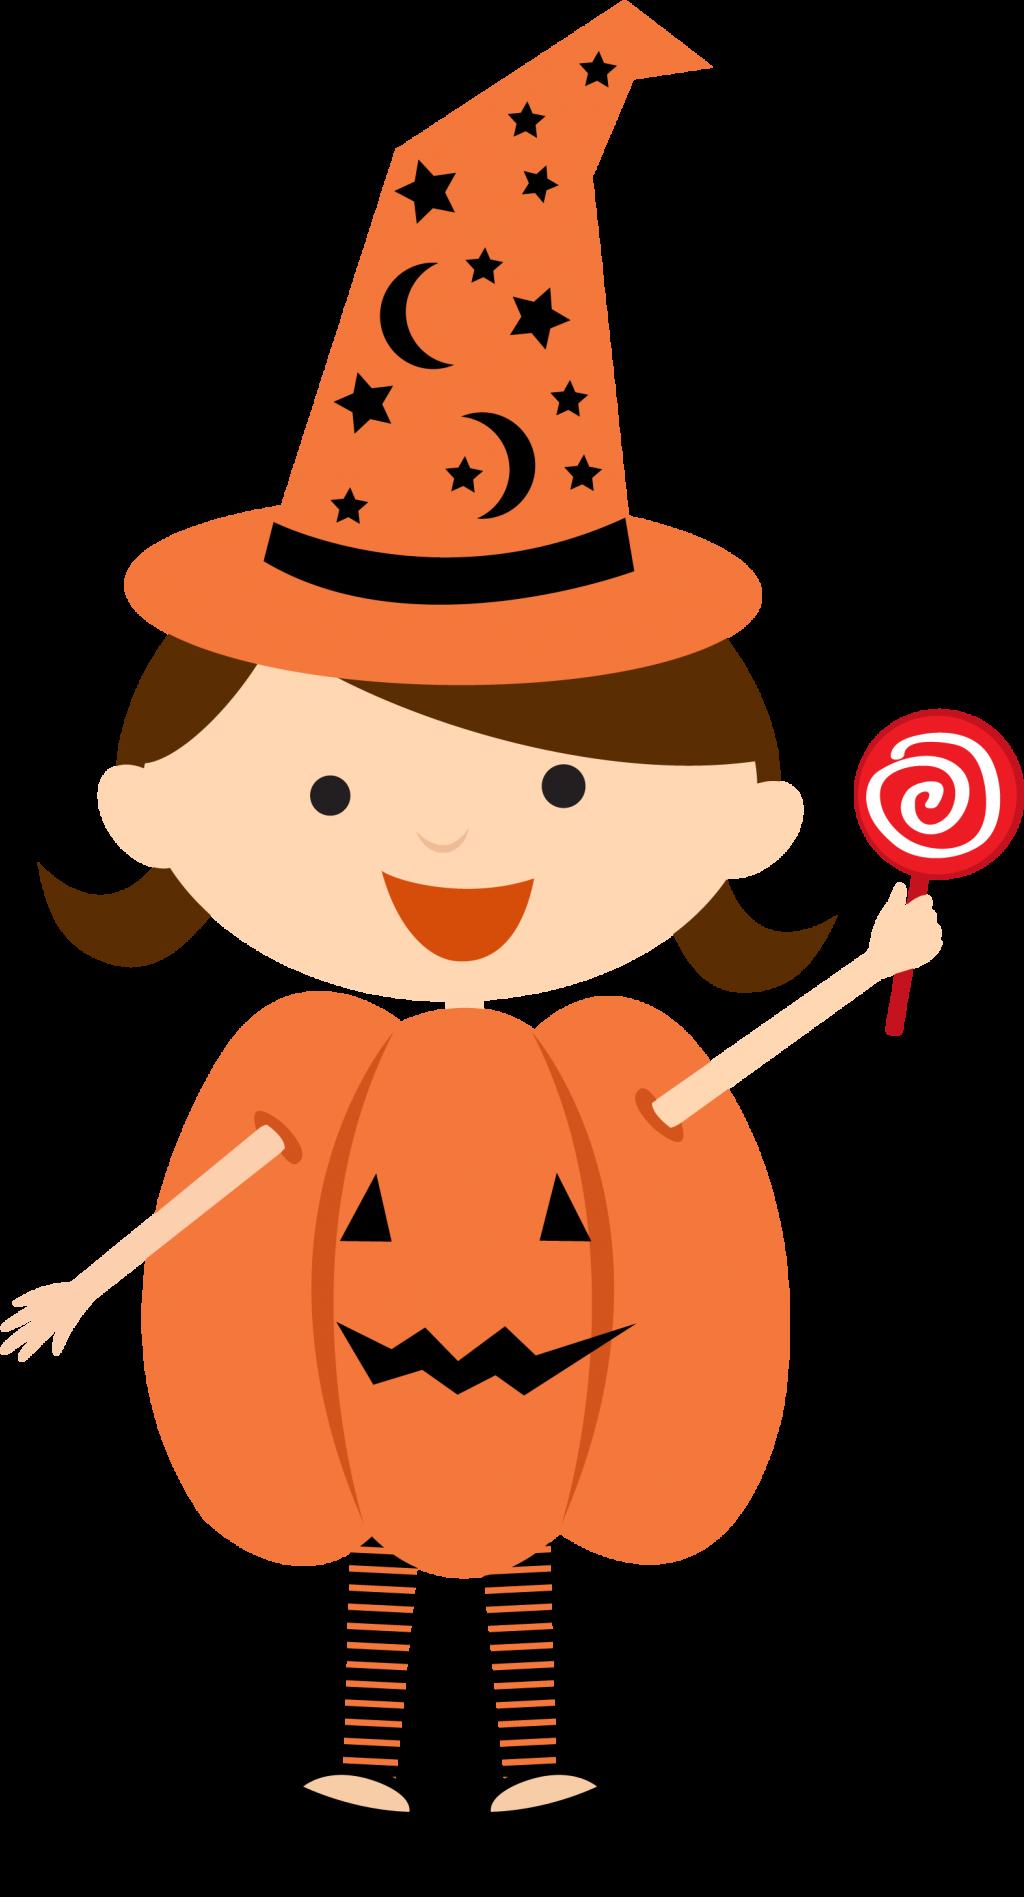 Halloween cartoon clipart banner library download Halloween Eyeball Clipart   Free download best Halloween Eyeball ... banner library download